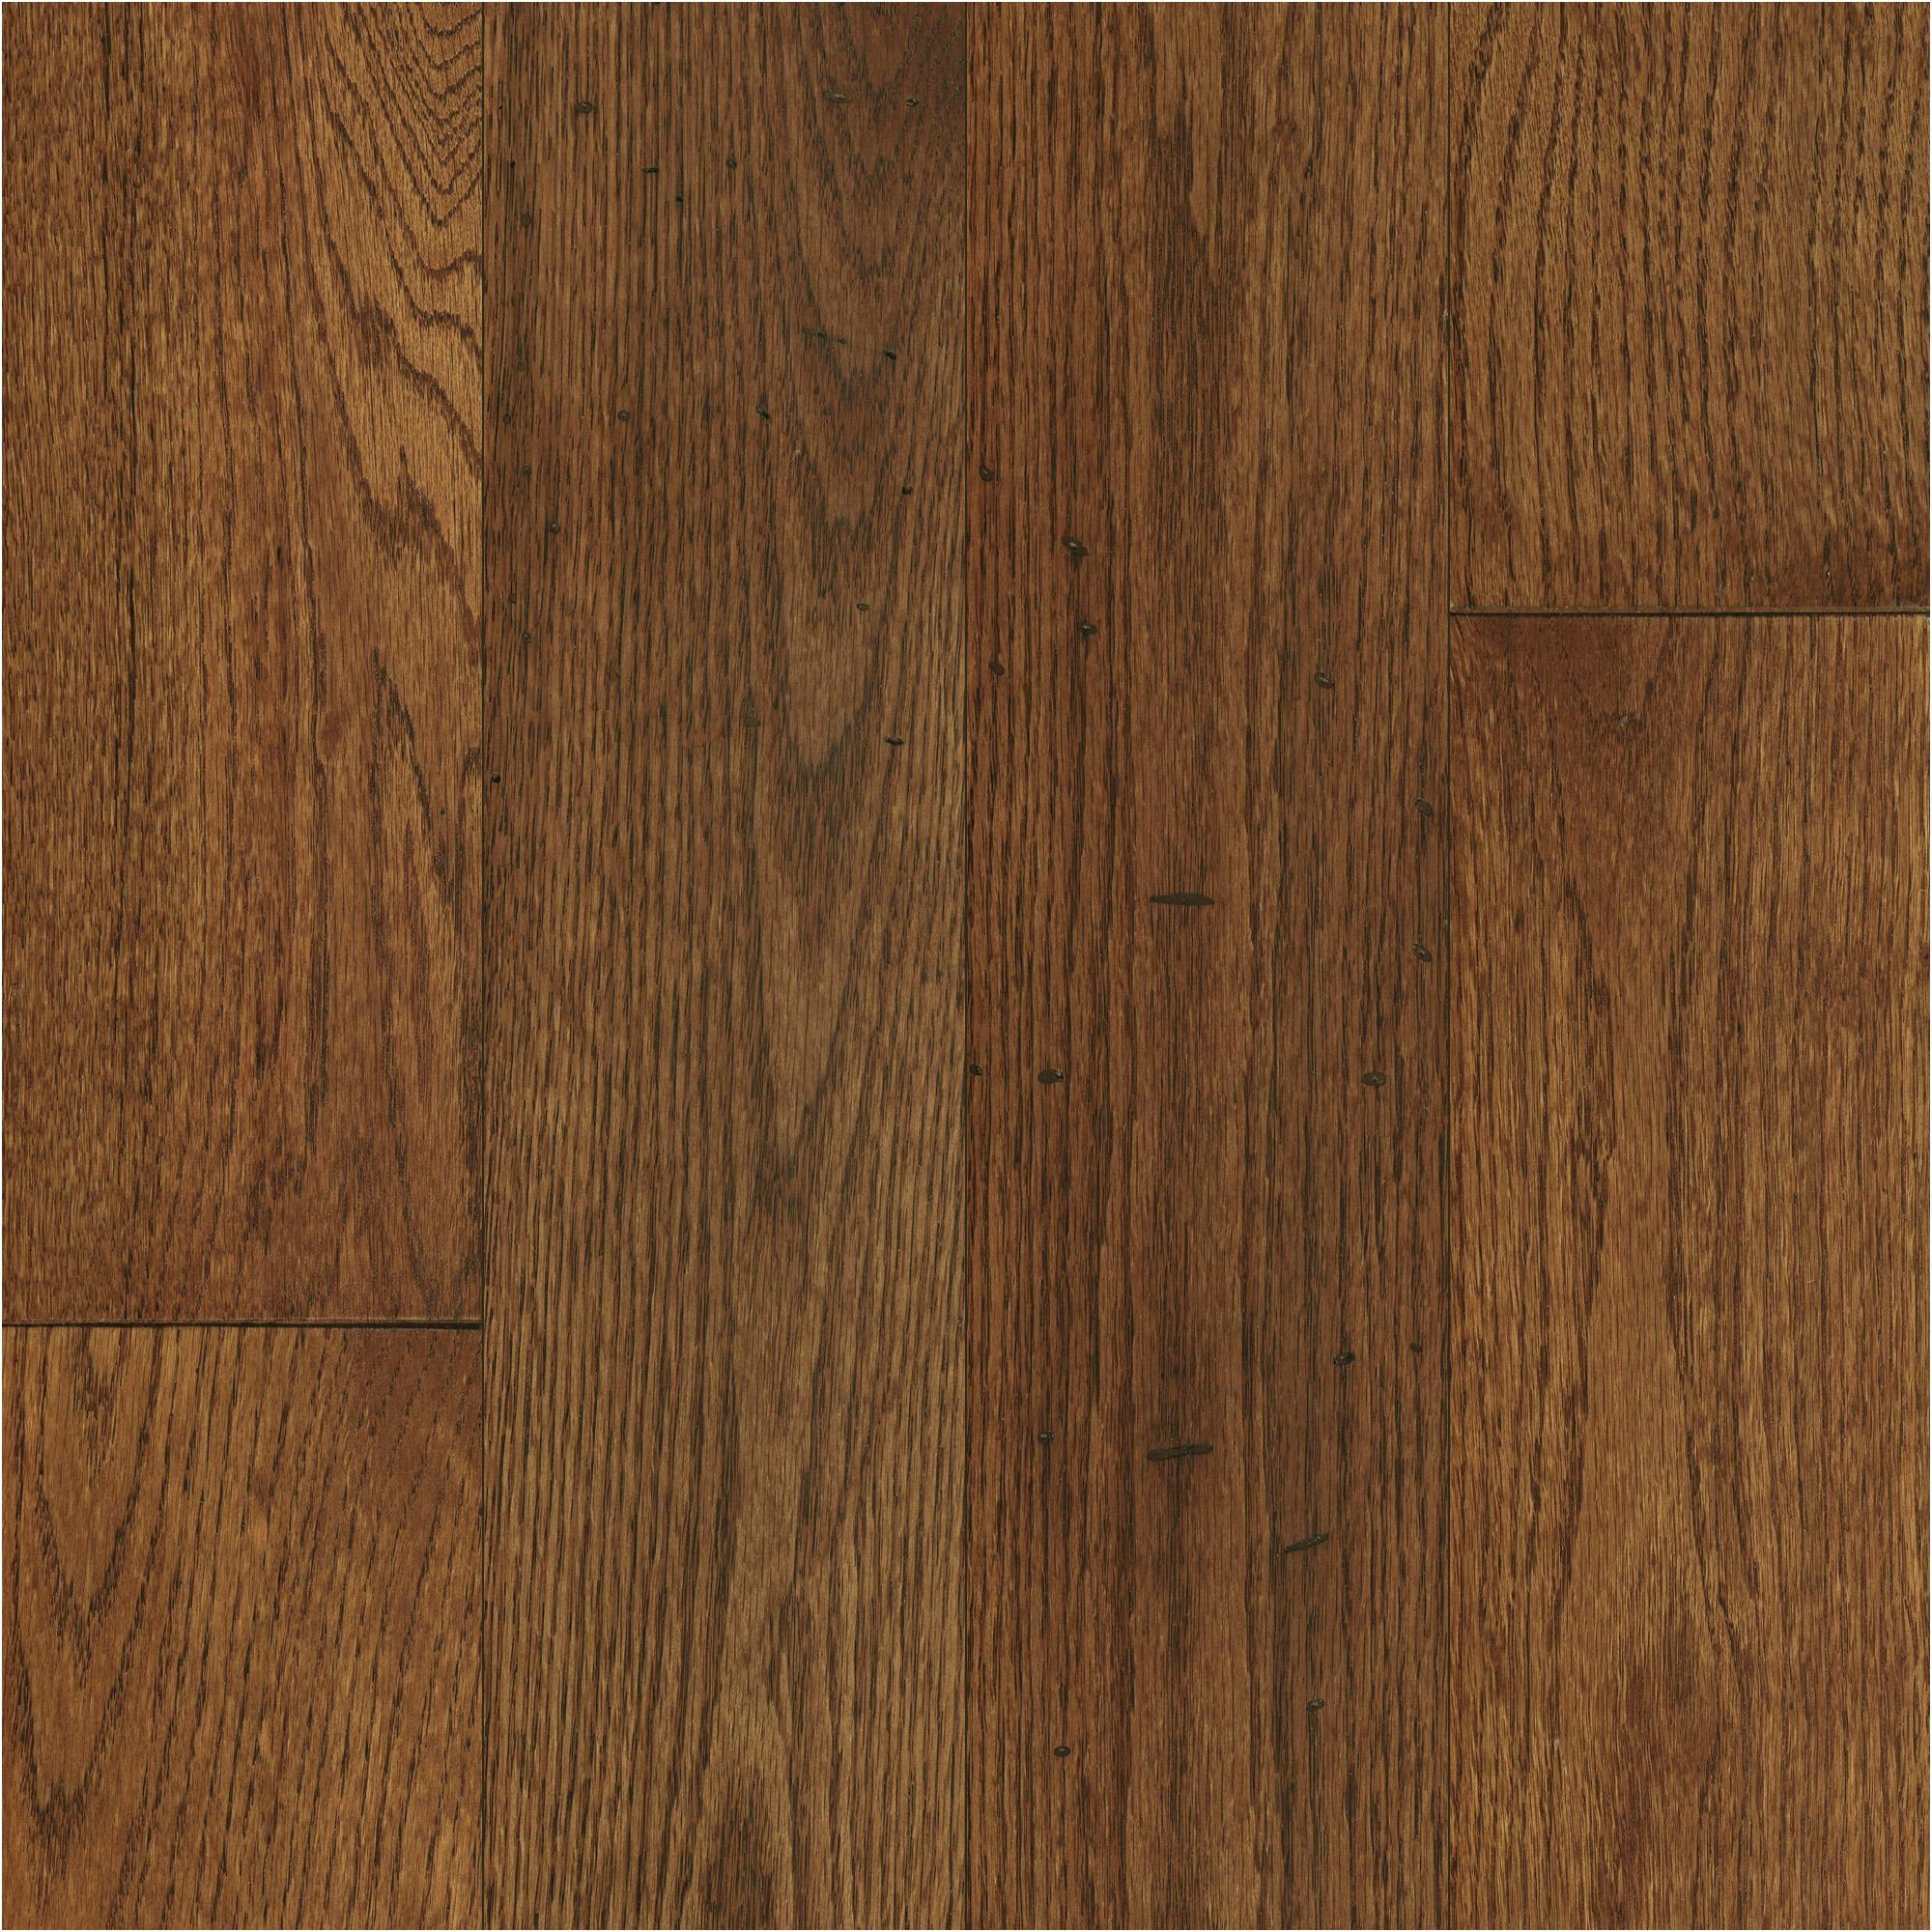 laminate flooring vs engineered hardwood cost of laminate flooring vs engineered hardwood elegant hardwood floors vs with regard to laminate flooring vs engineered hardwood new hardwood floor design swiftlock laminate flooring installing of laminate flooring